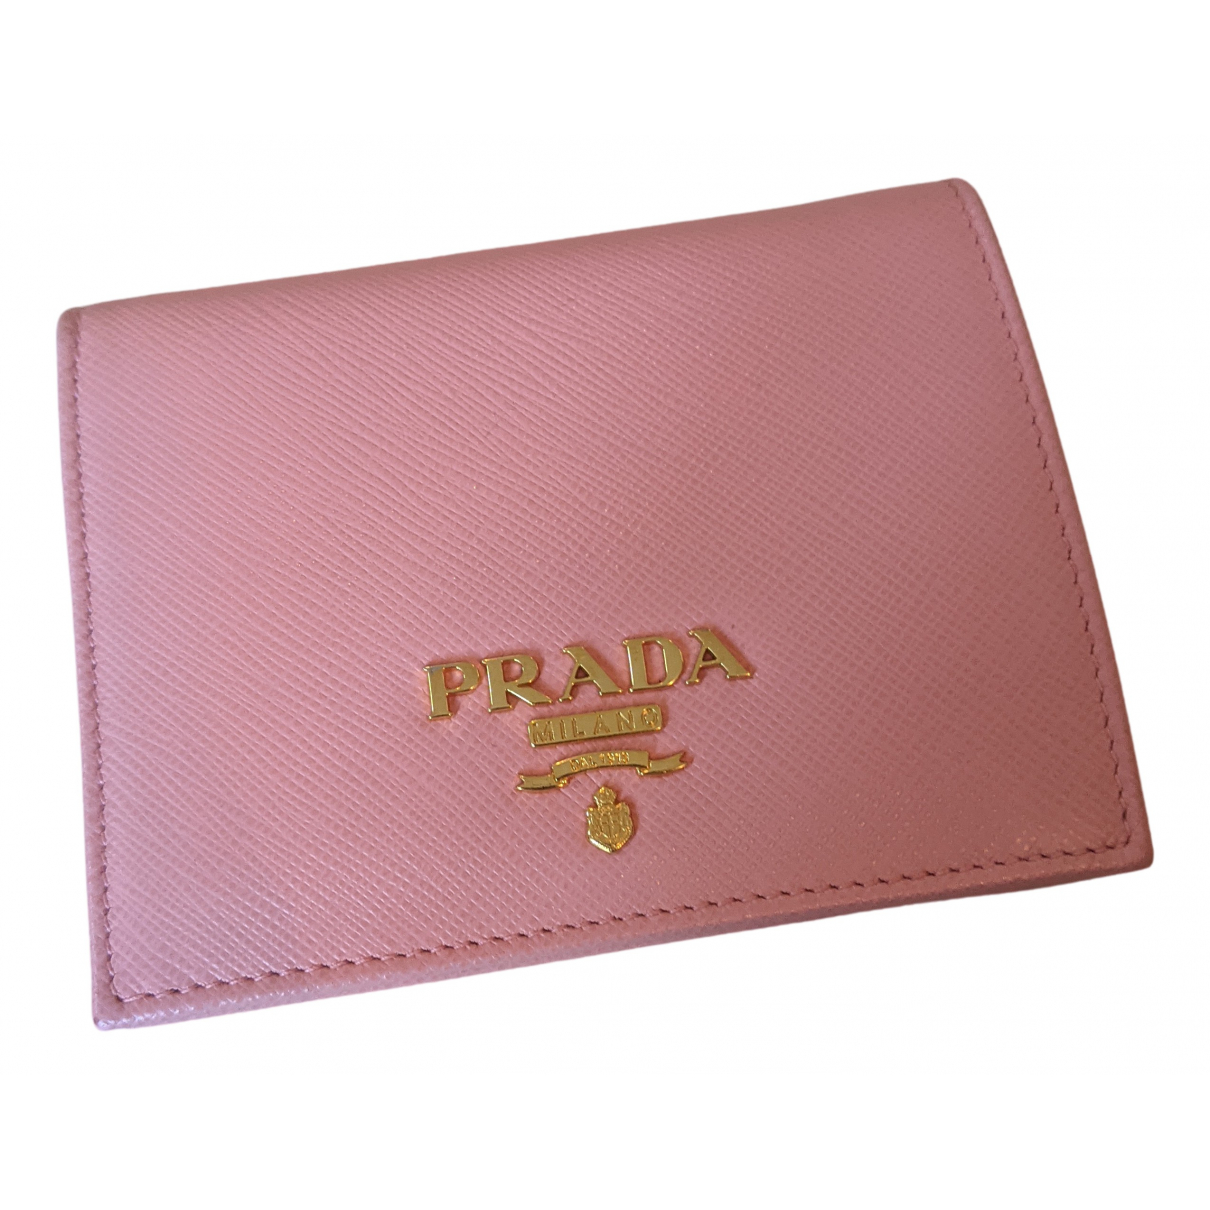 Prada \N Portemonnaie in  Rosa Leder